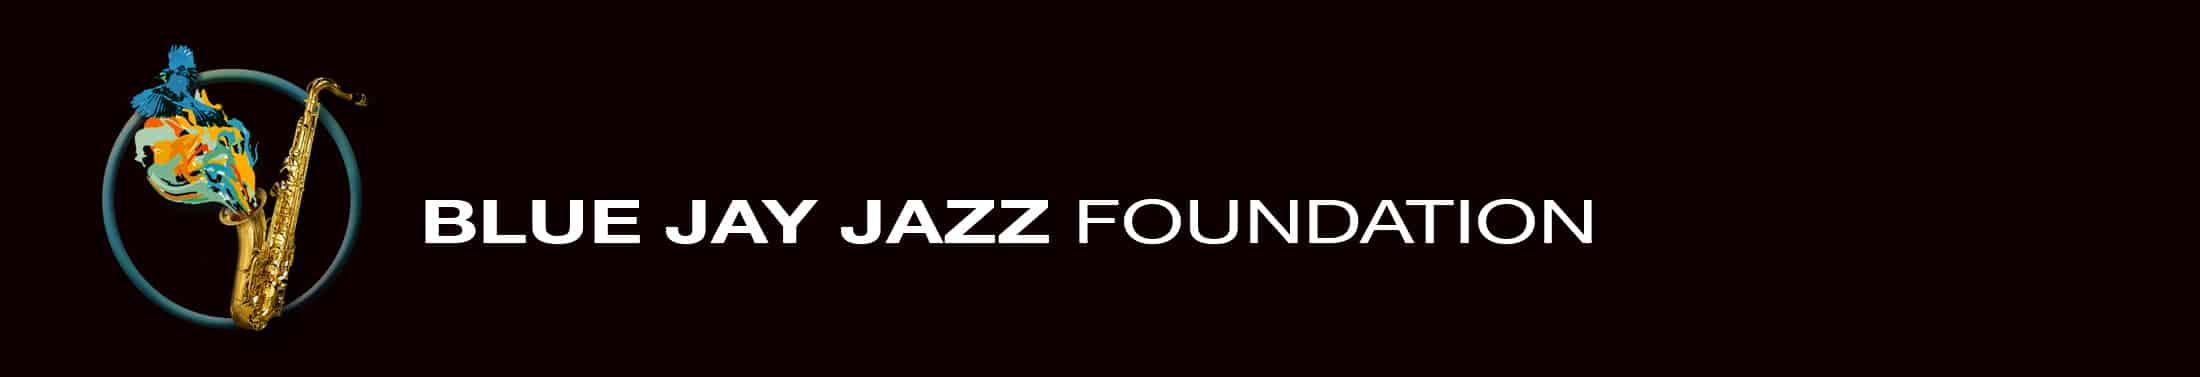 Blue Jay Jazz Foundation